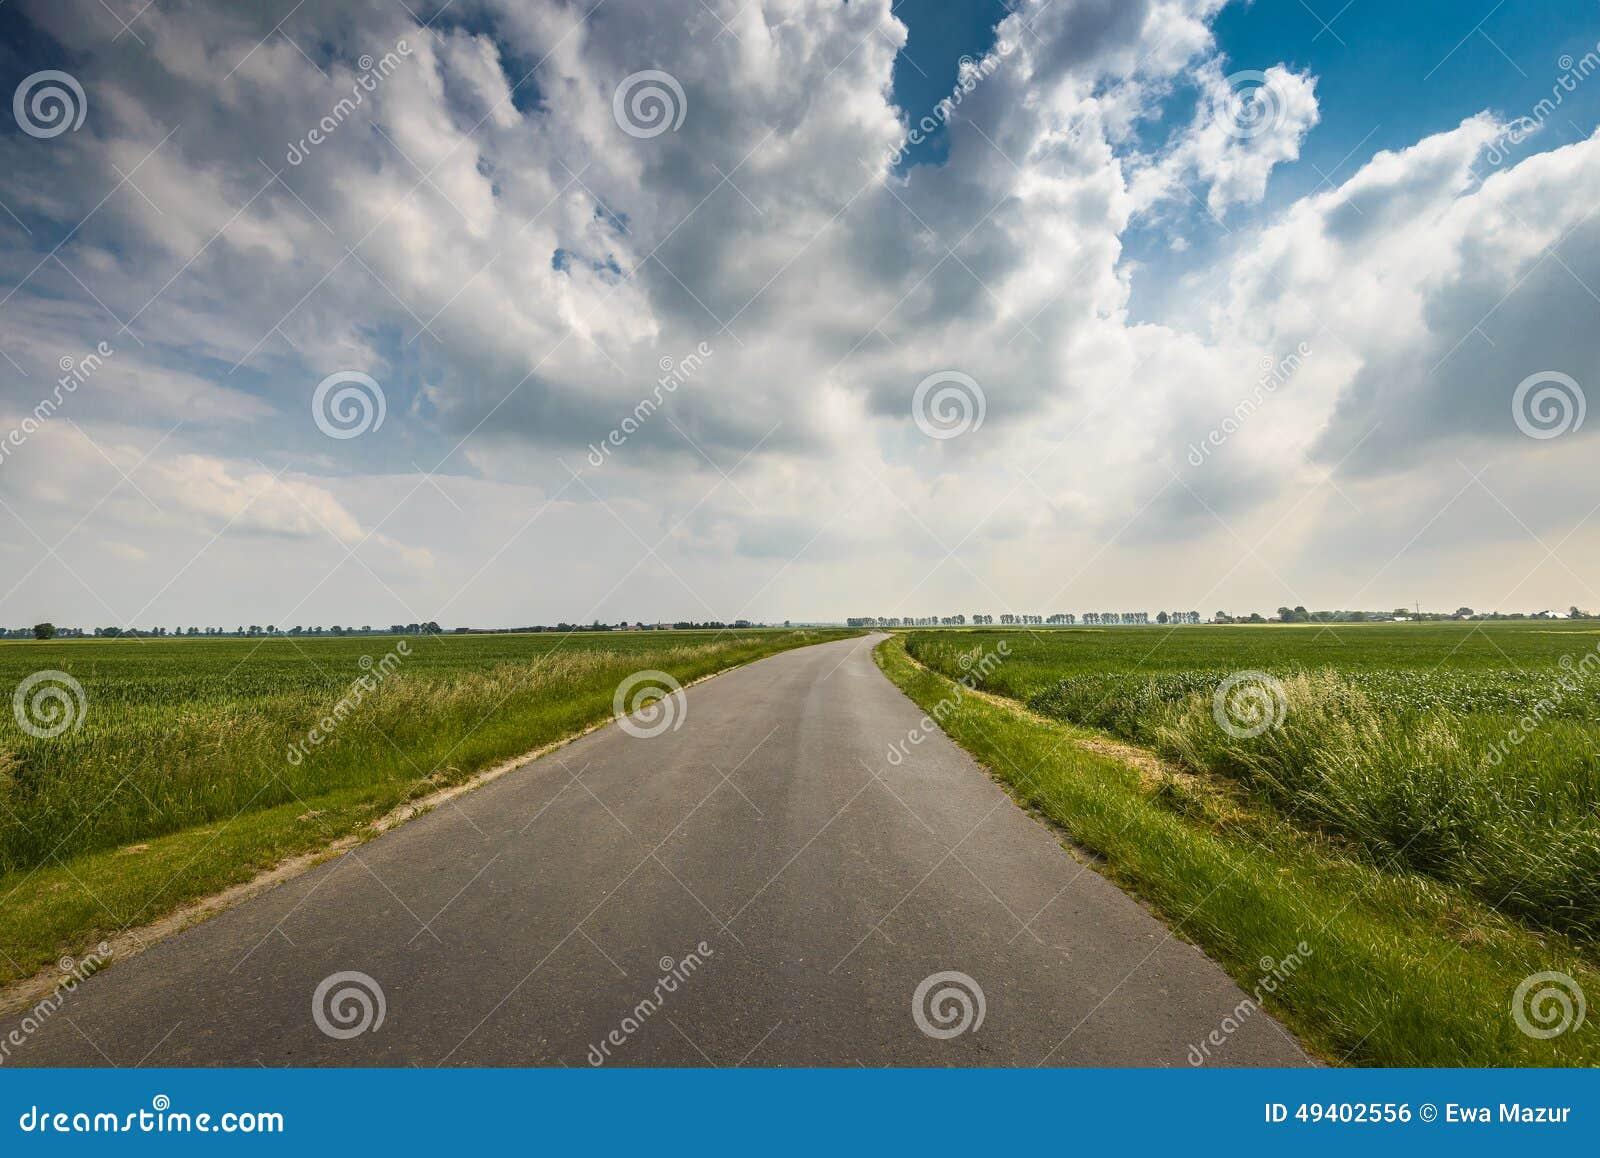 Download Feld stockfoto. Bild von szene, mais, bewölkt, grow, betrieb - 49402556